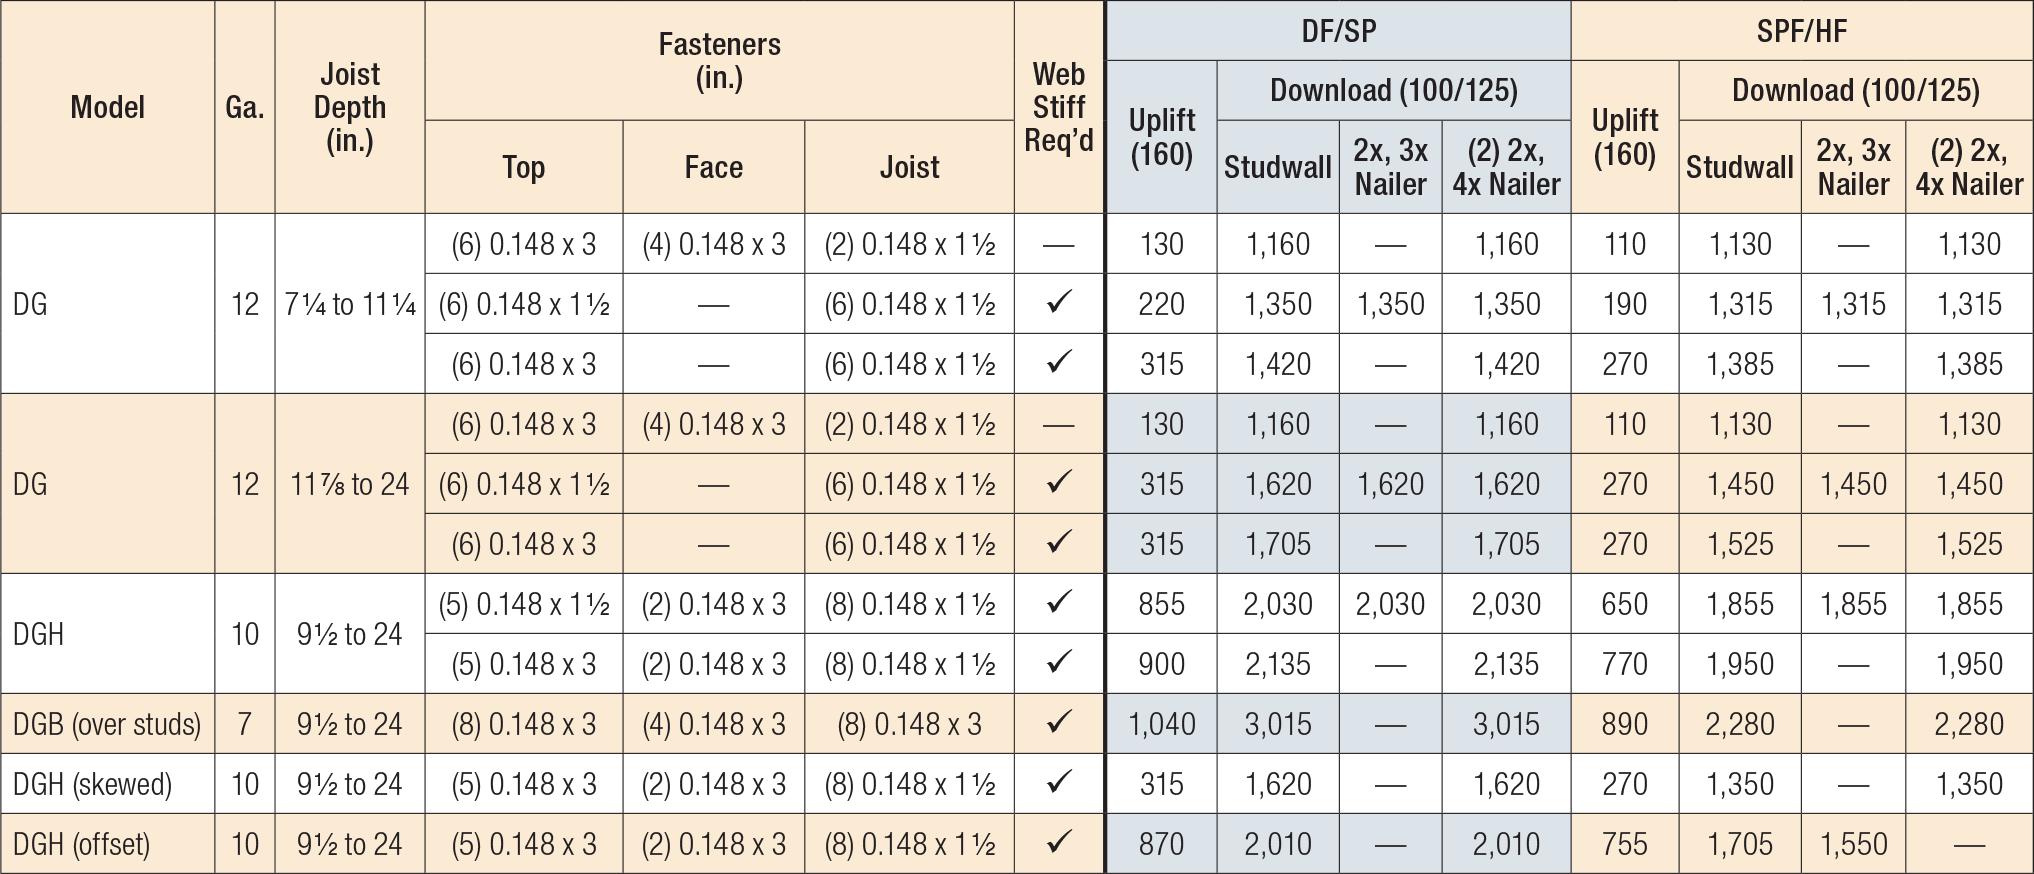 DG/DGB/DGH Fire Wall Hangers — Allowable Loads on 2x4 or 2x6 Wall